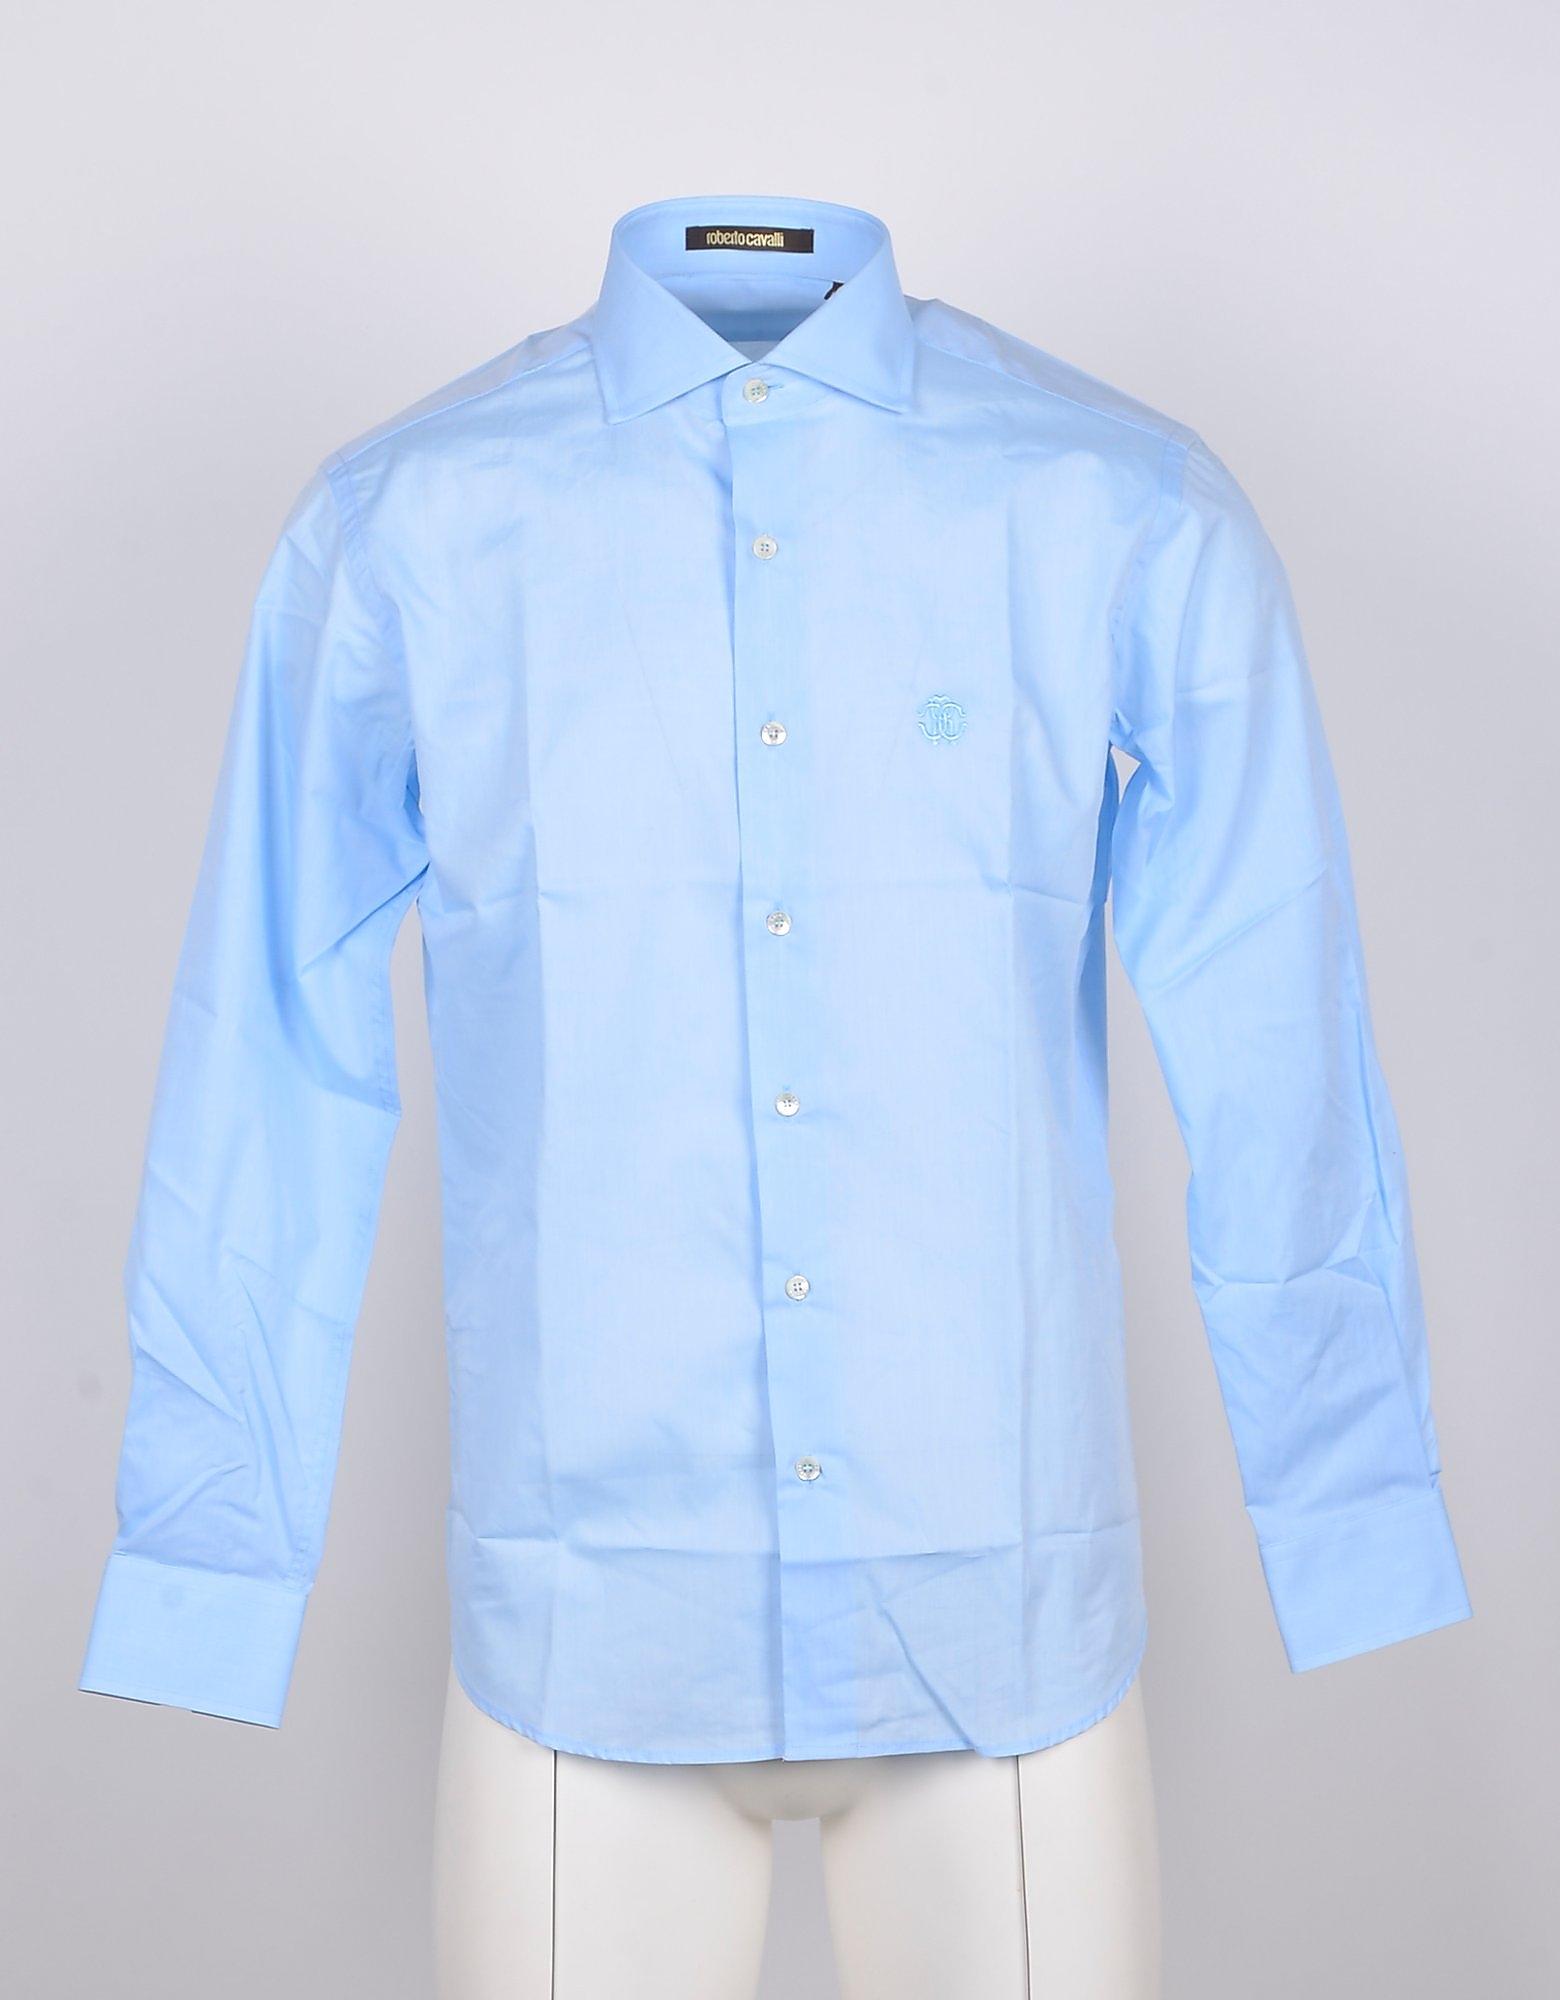 Roberto Cavalli Designer Shirts, Sky Blue COtton Men's Shirt